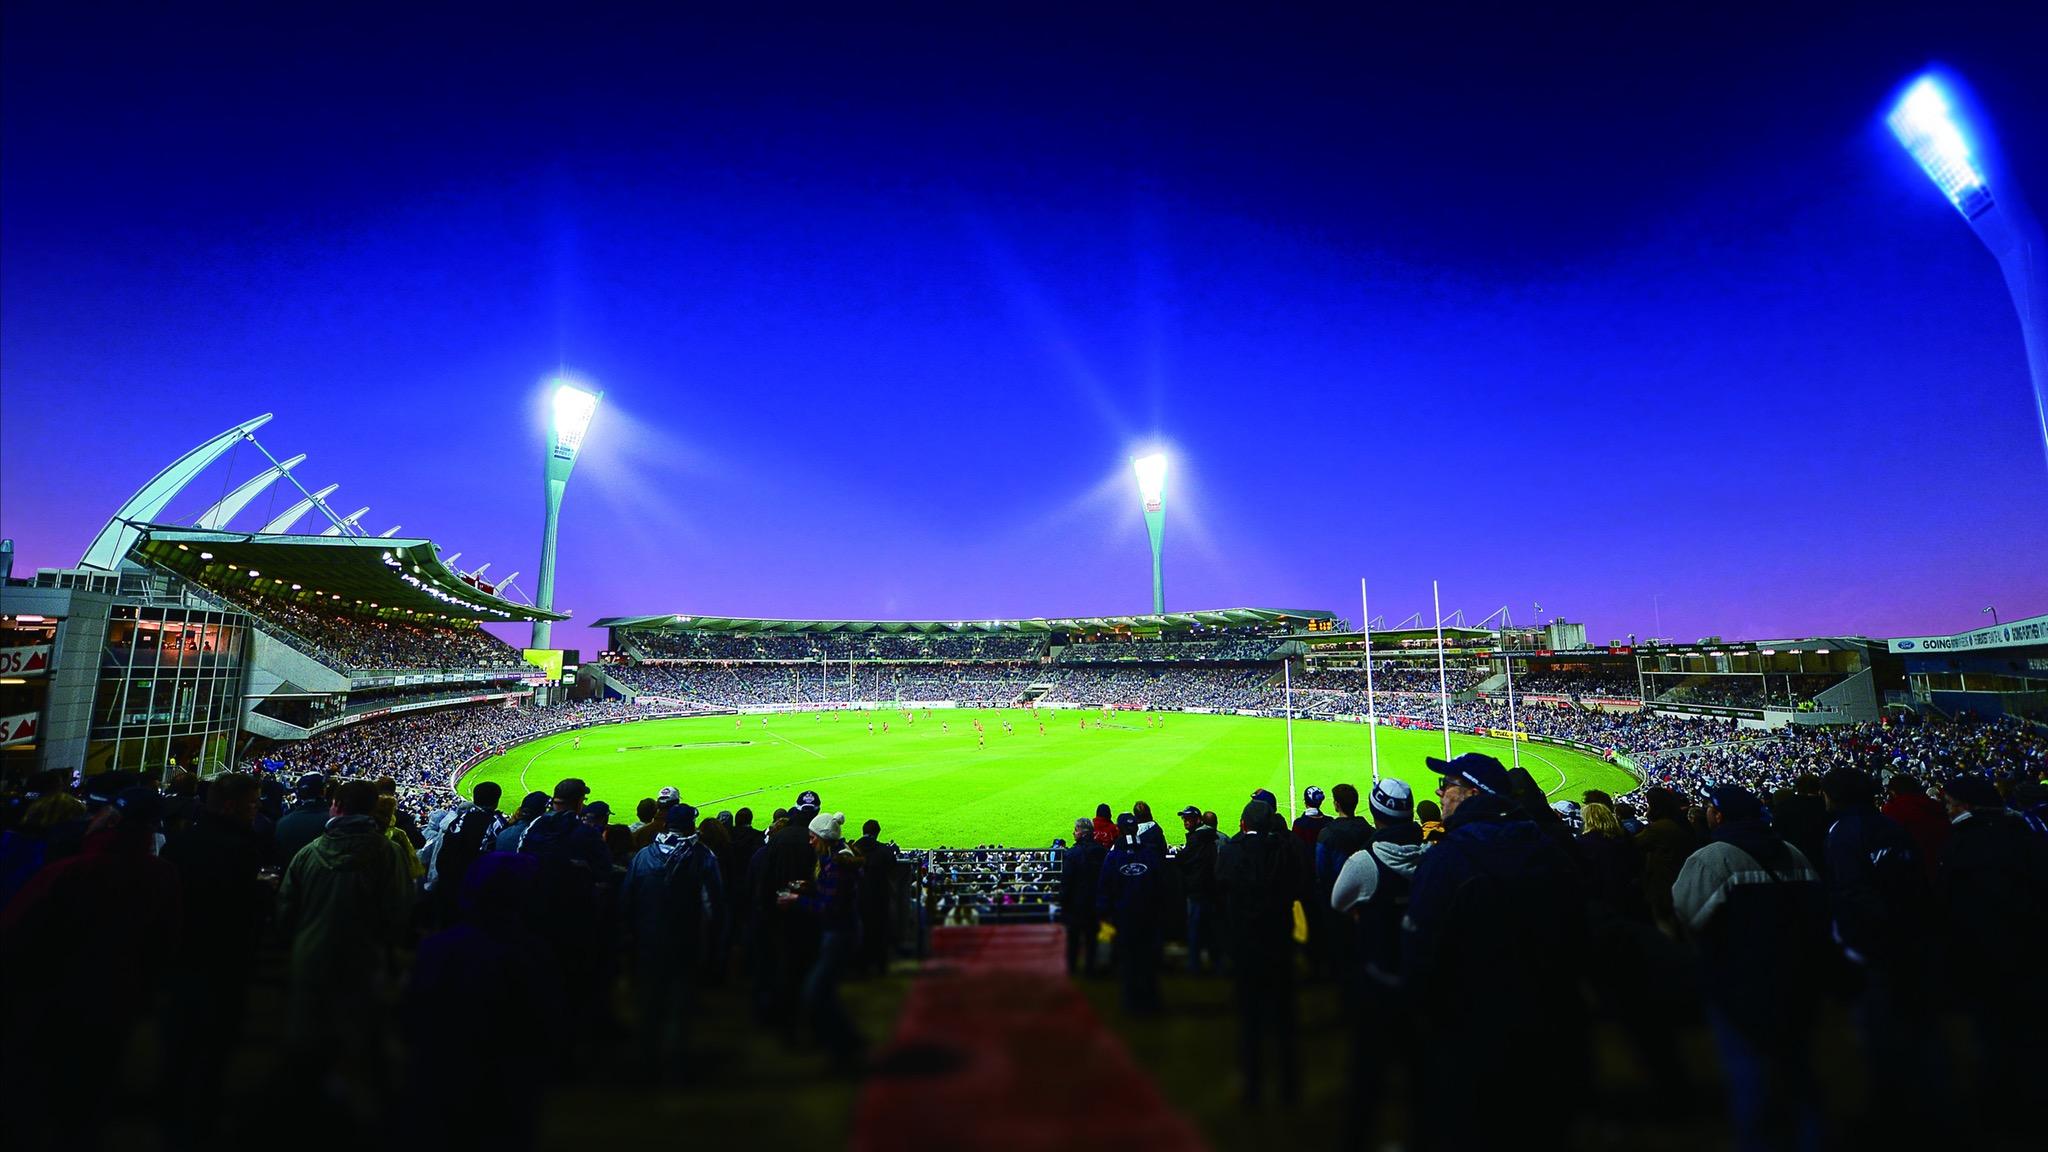 The Simonds Stadium